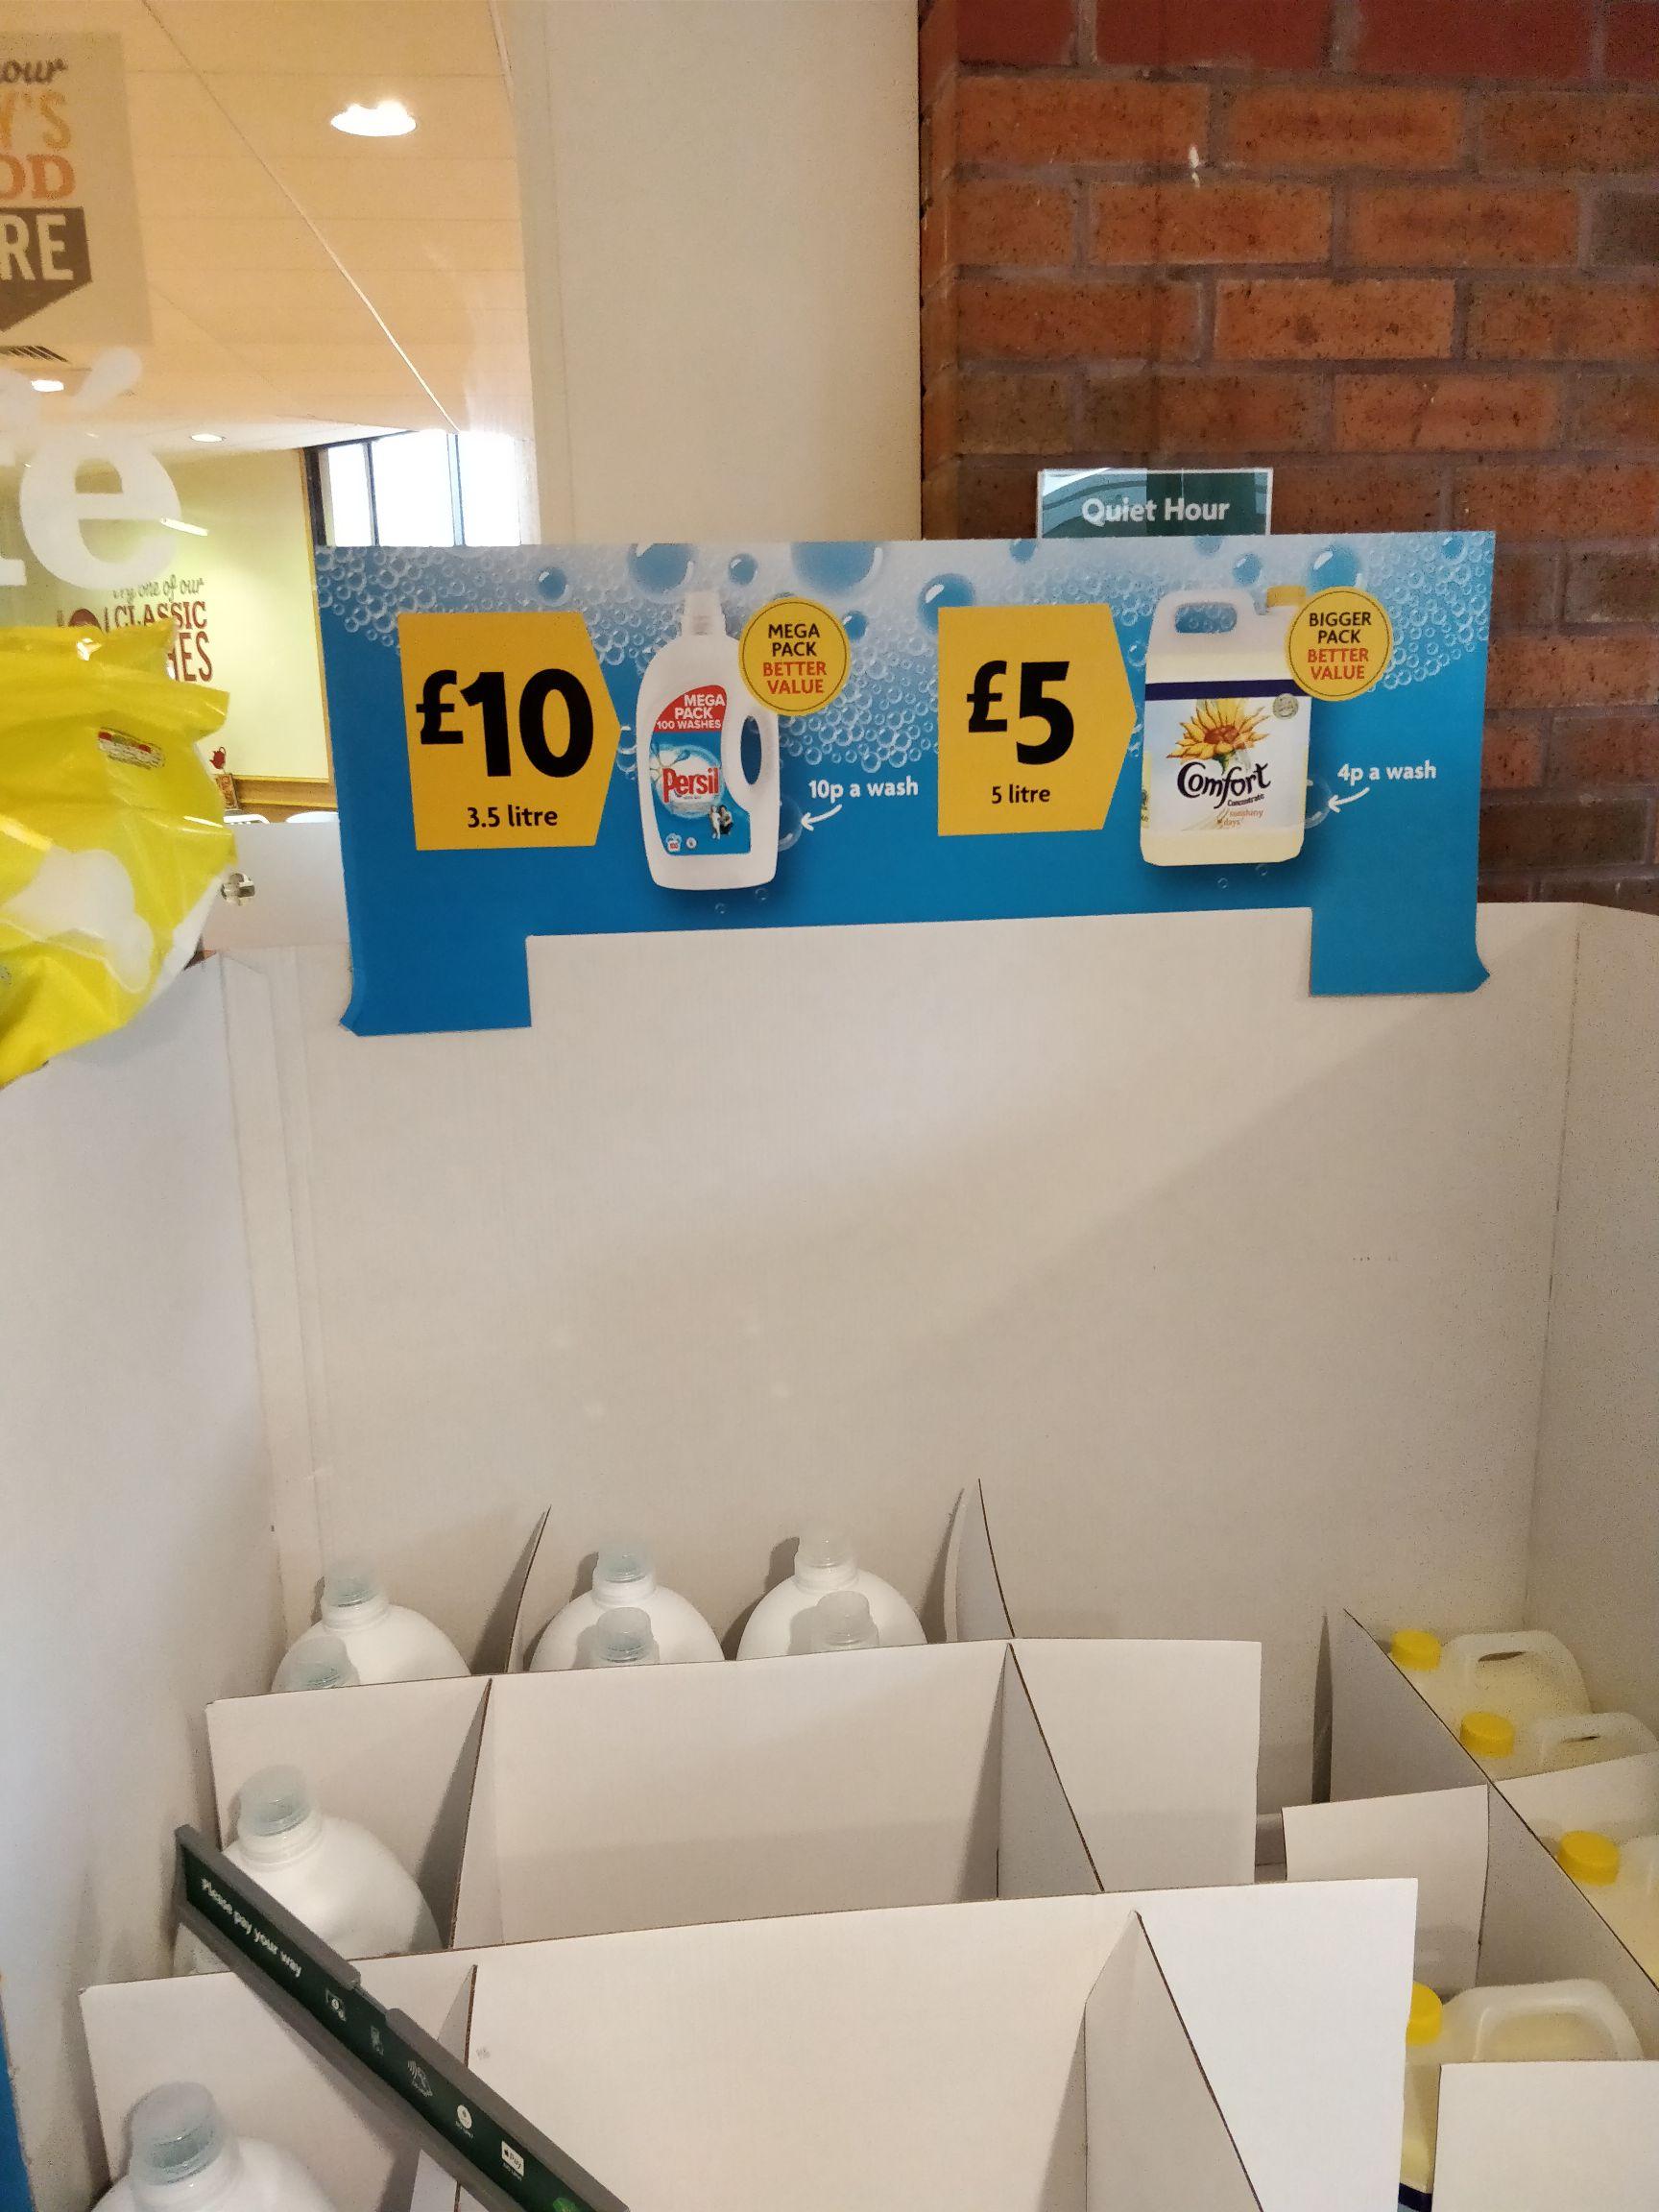 Persil 100 Wash £10 & Comfort 166 Wash £5 @ Morrisons. 7 pcent cashback on Santander 1/2/3 cards with a £30 Spend.